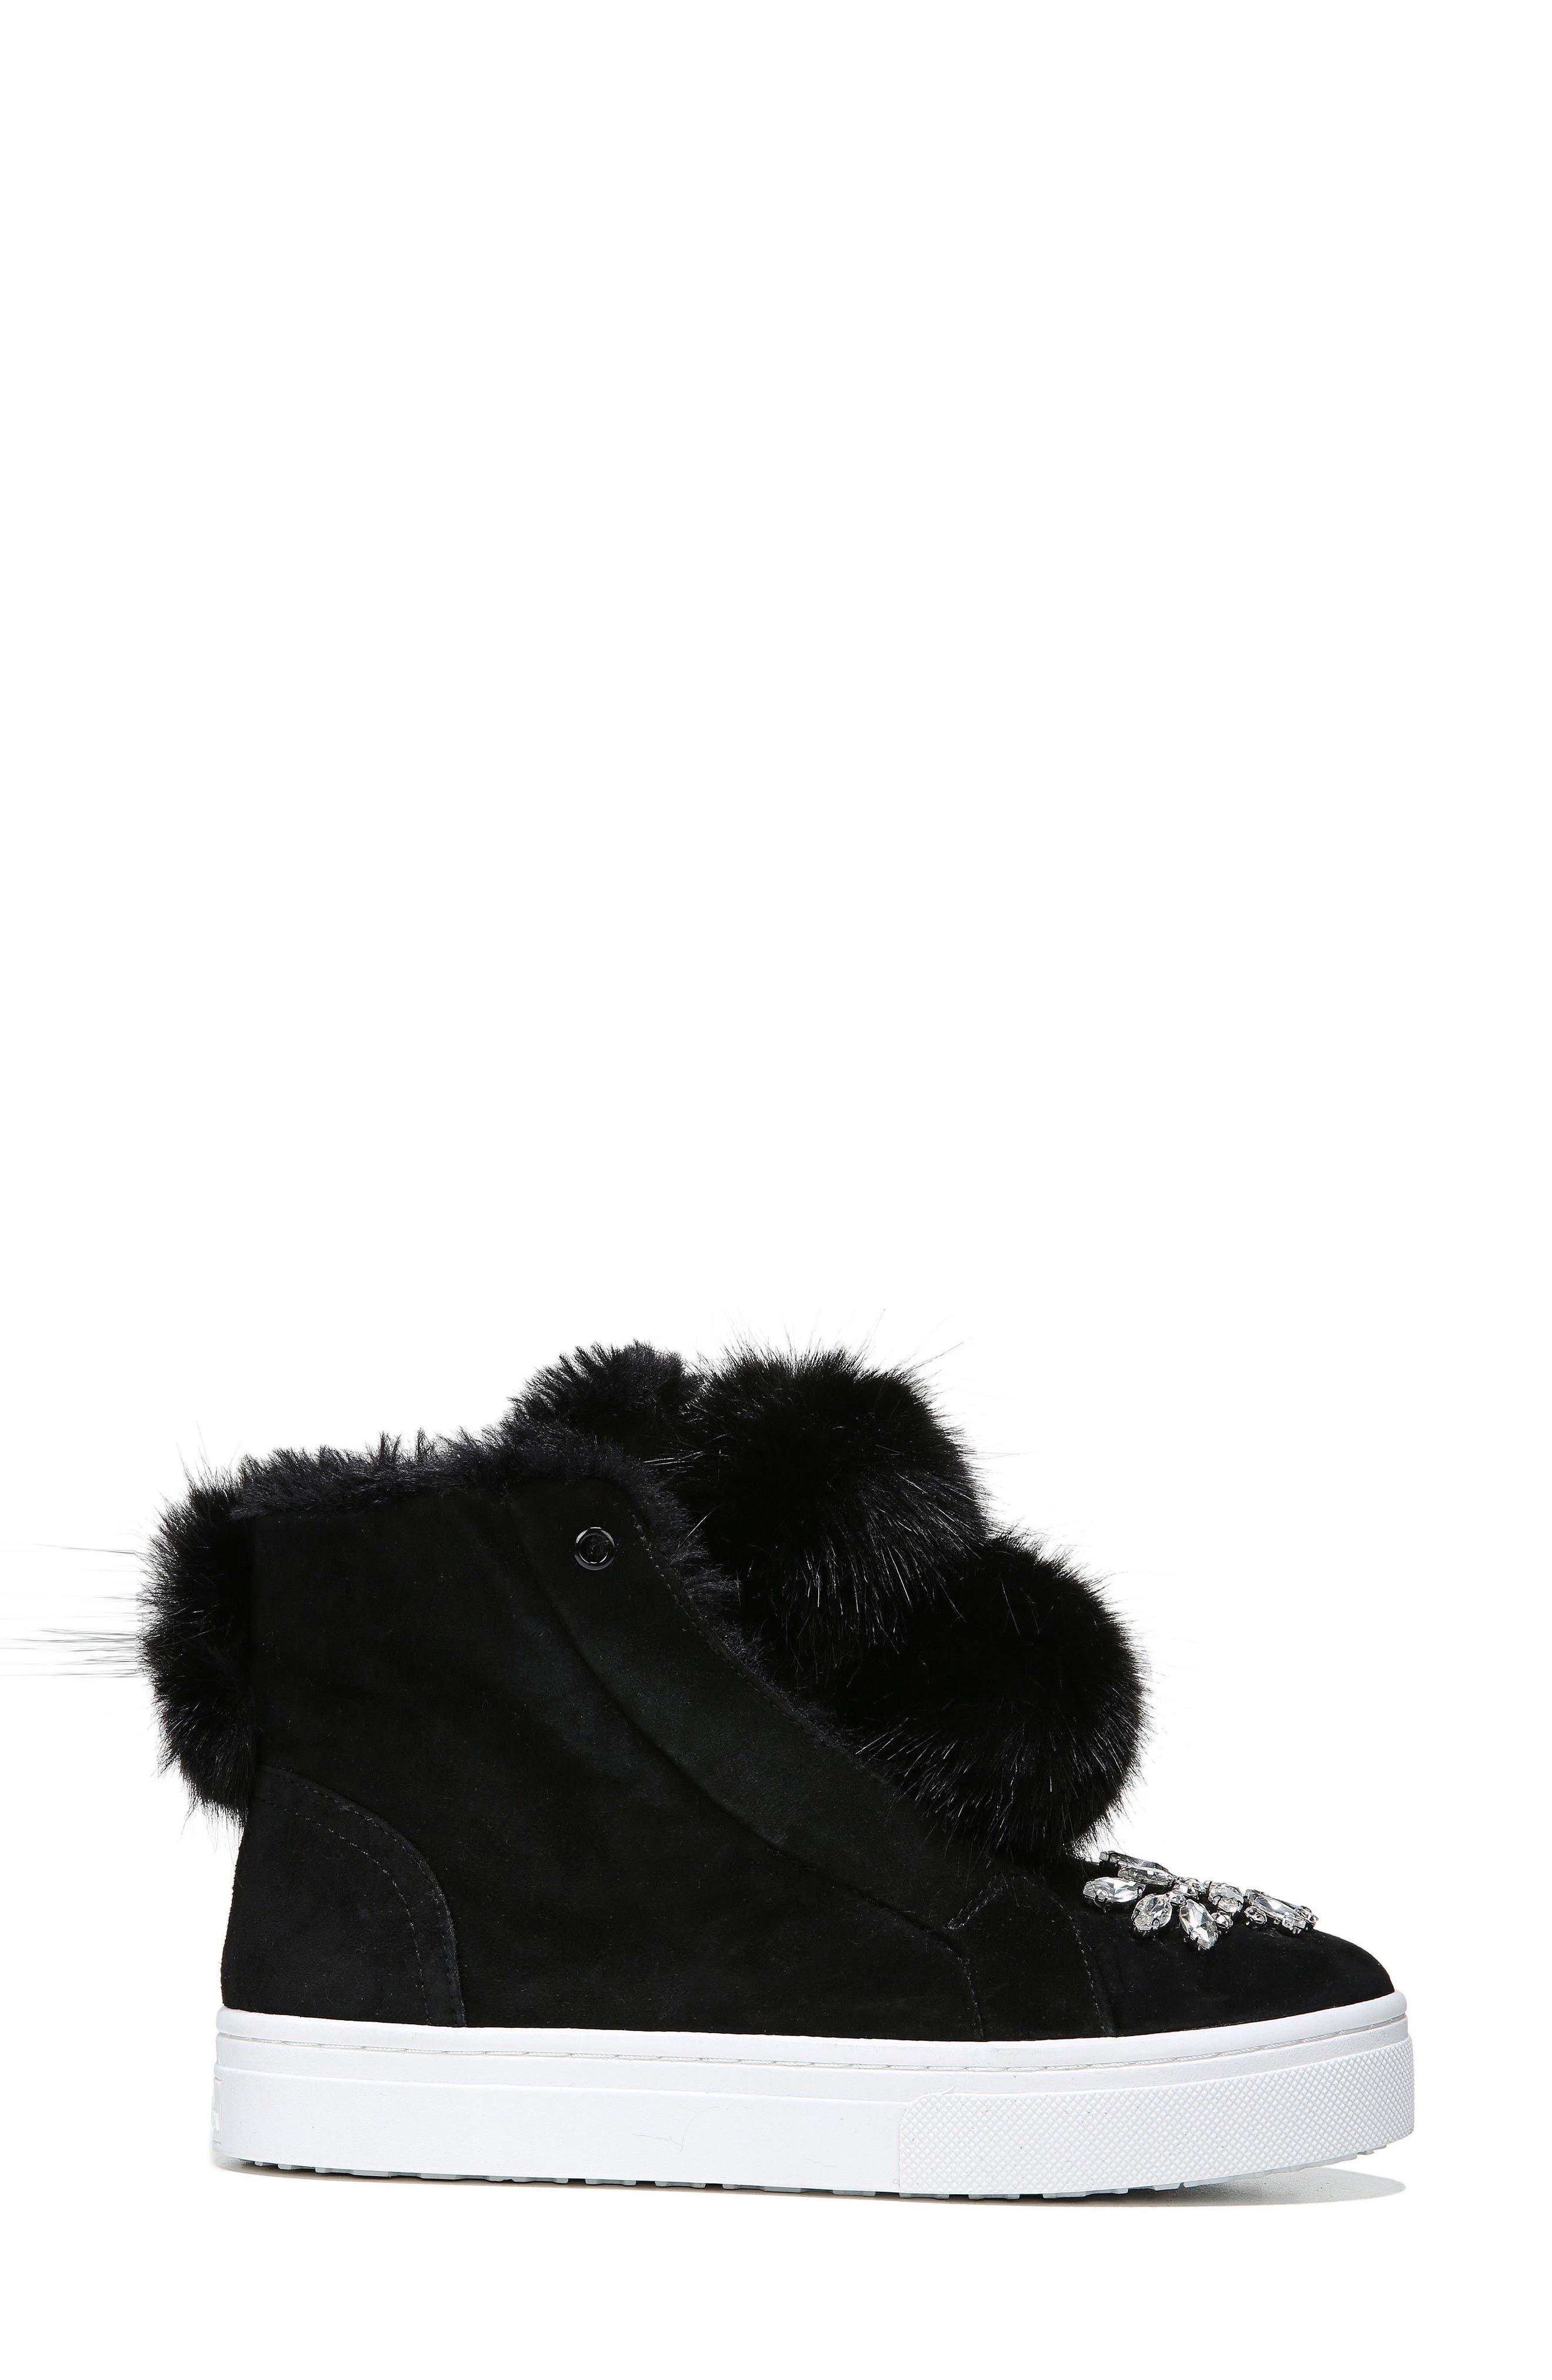 Leland Faux Fur Sneaker,                             Alternate thumbnail 3, color,                             001